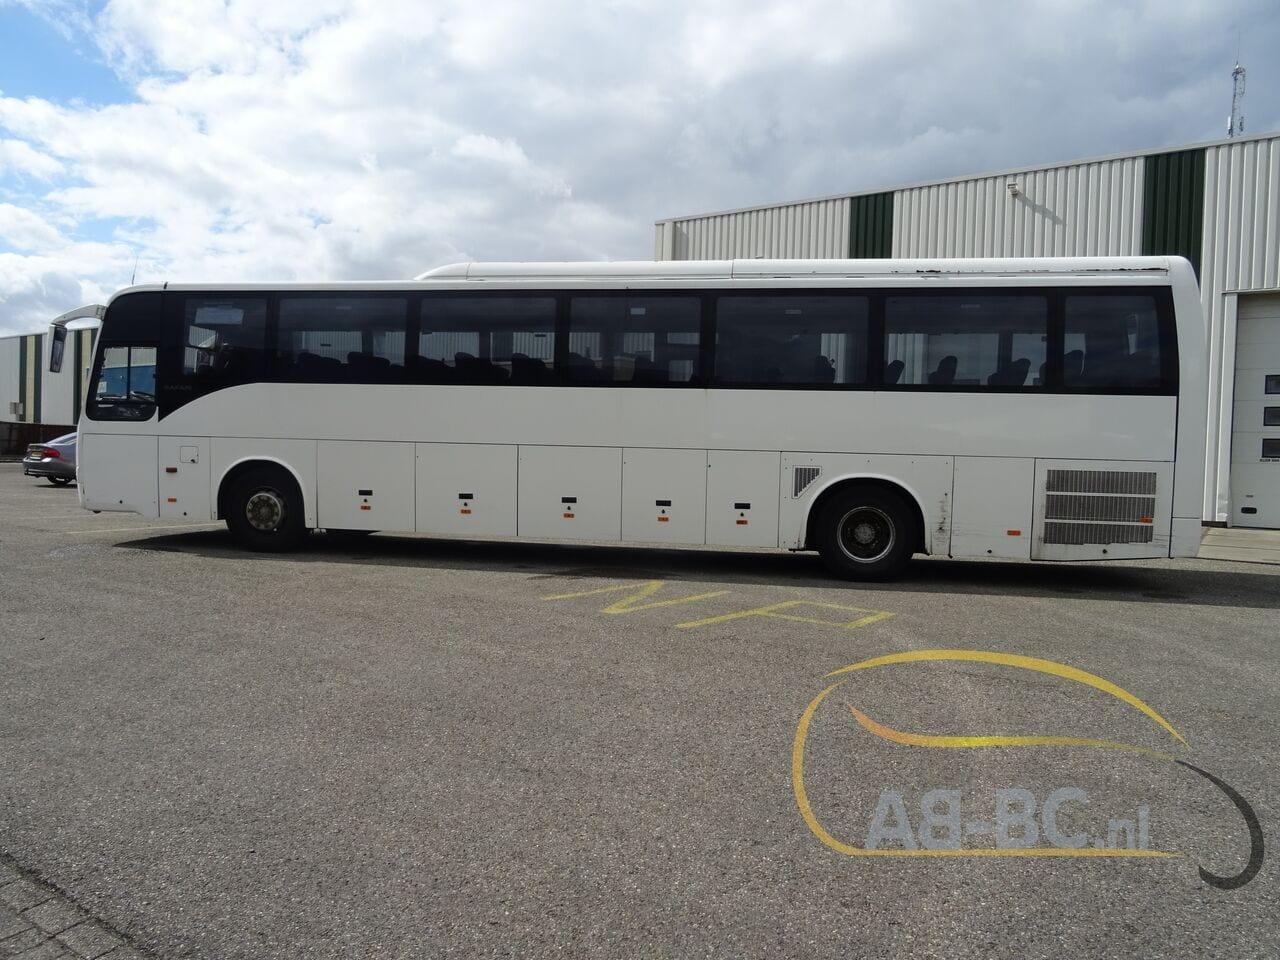 coach-busTEMSA-Safari-RD-65-Seats---1620311720422523447_big_3312b19a1d347187132134b29583453b--21050617272795316700